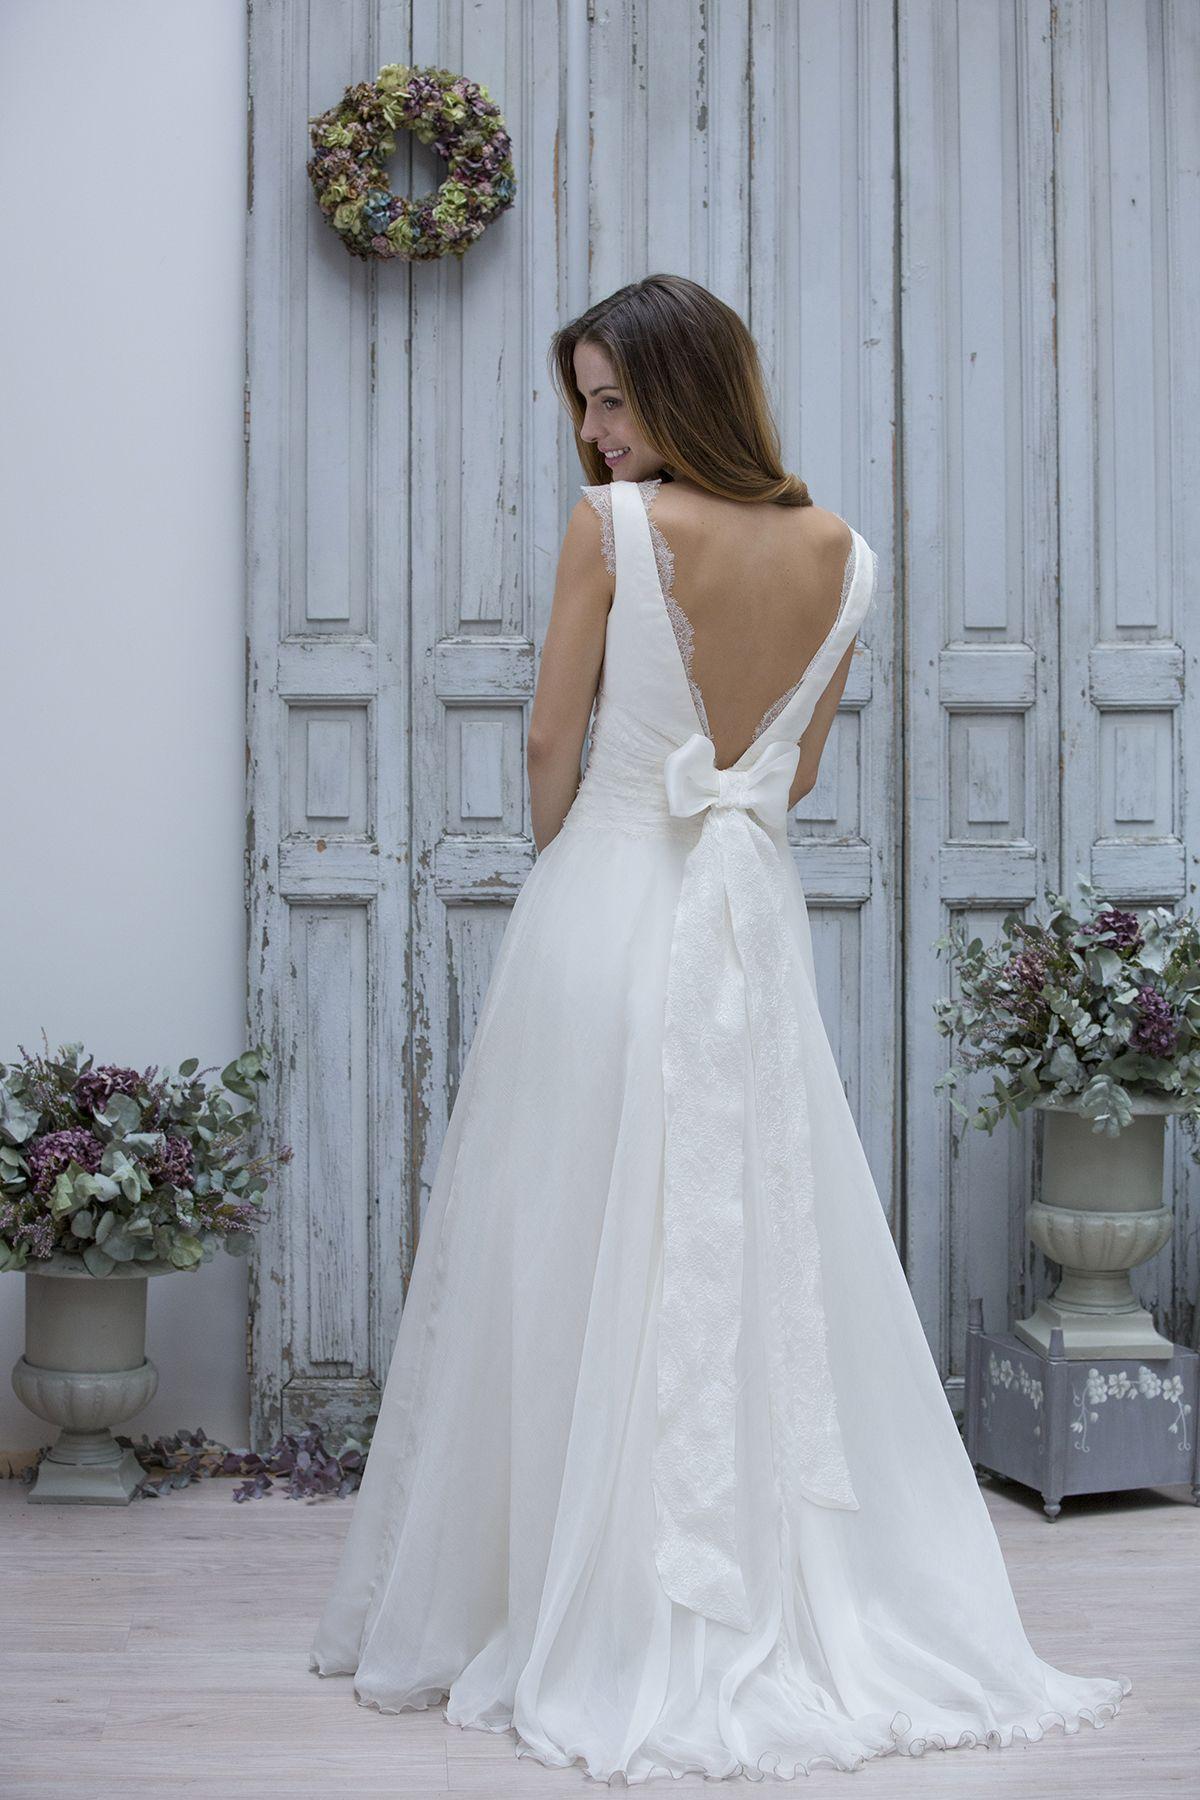 Robe de Mariée : Marie Laporte 2014 | Dressing gown, Wedding dress ...